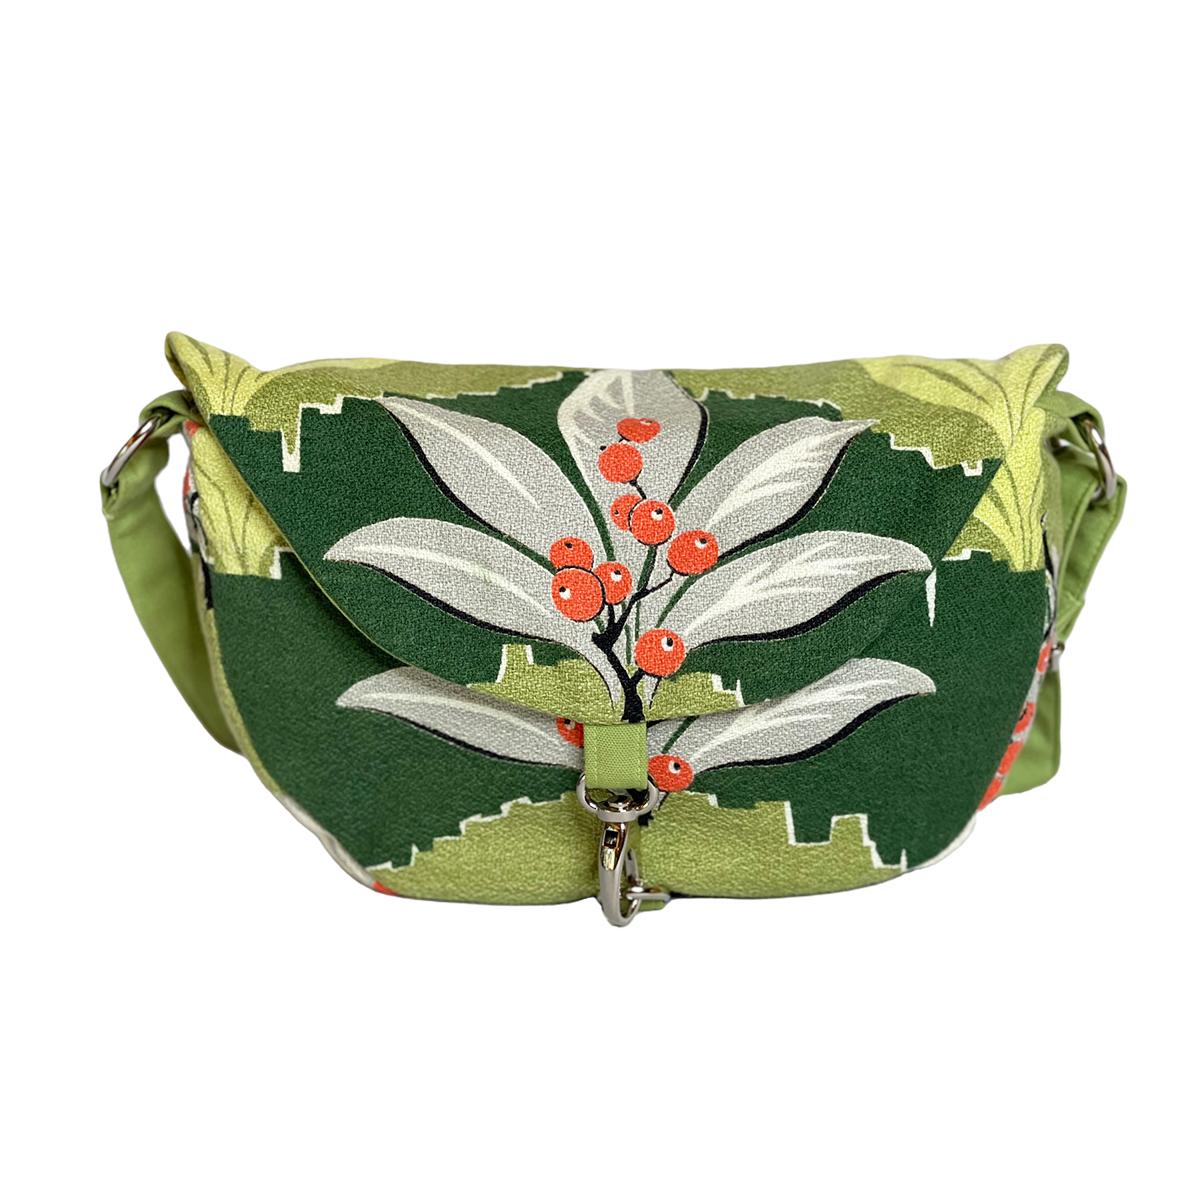 Vogue Bag – Mid Century Modern Leaf